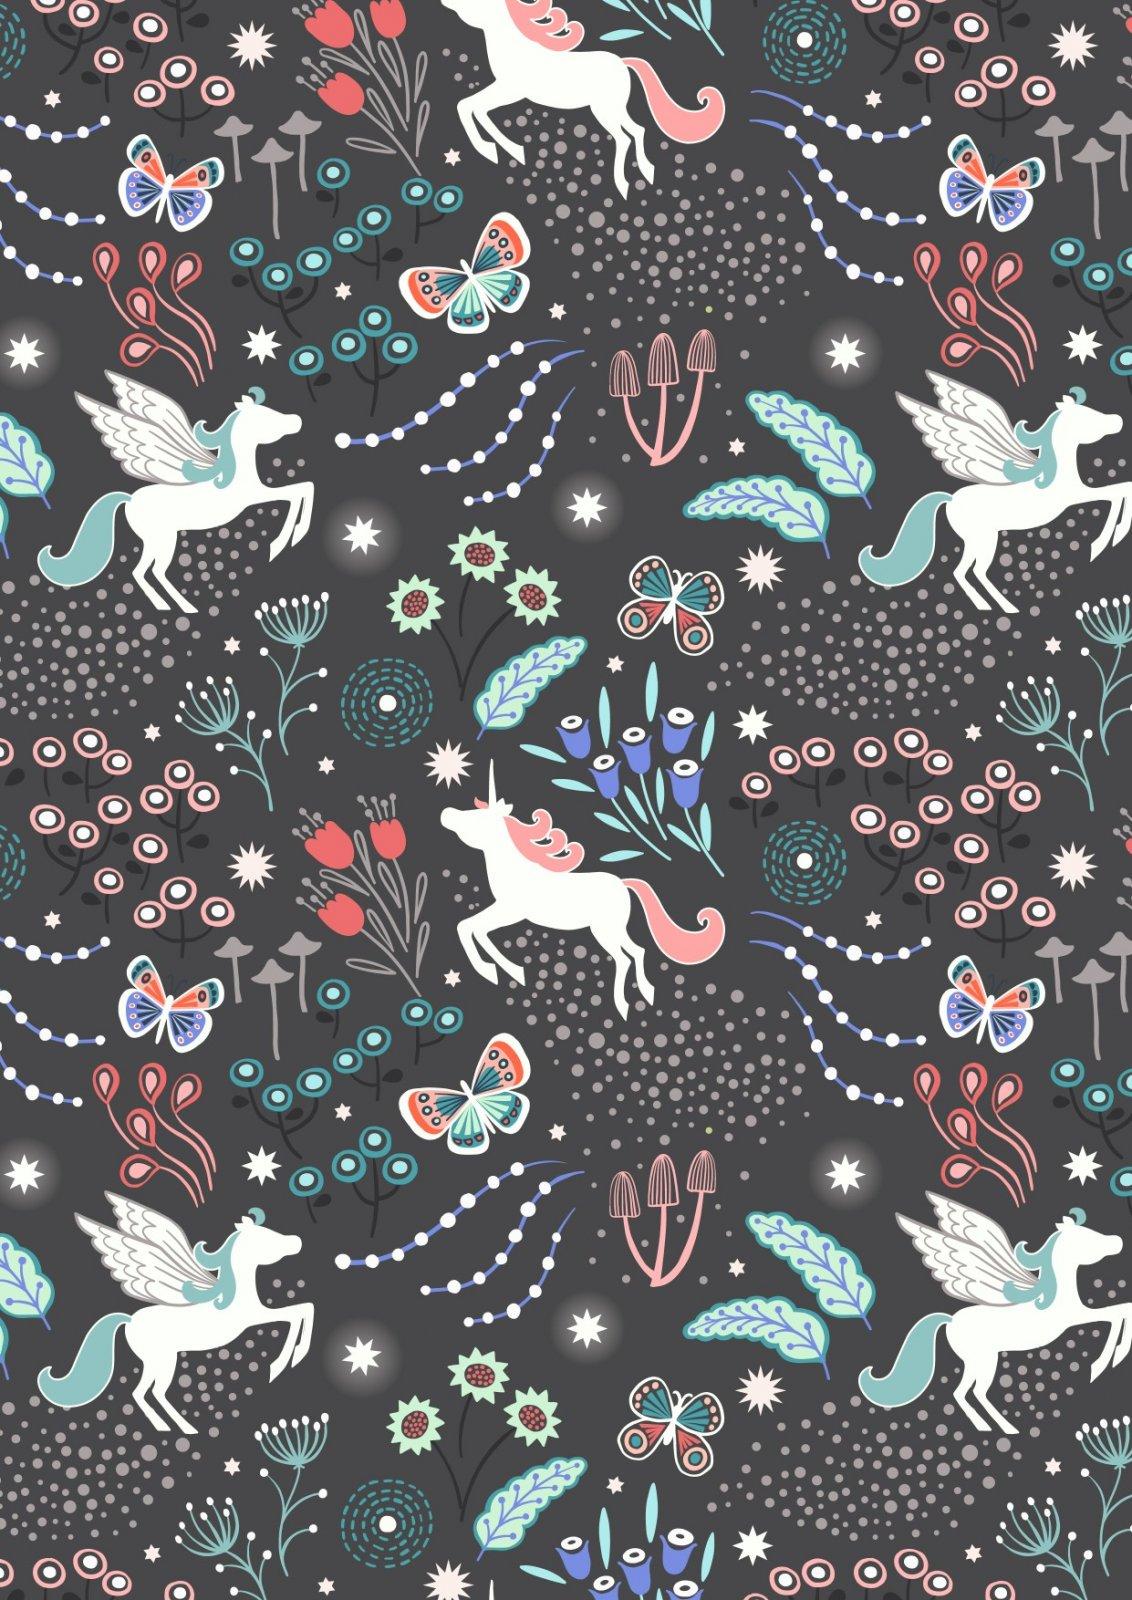 Unicorn Meadow on Black